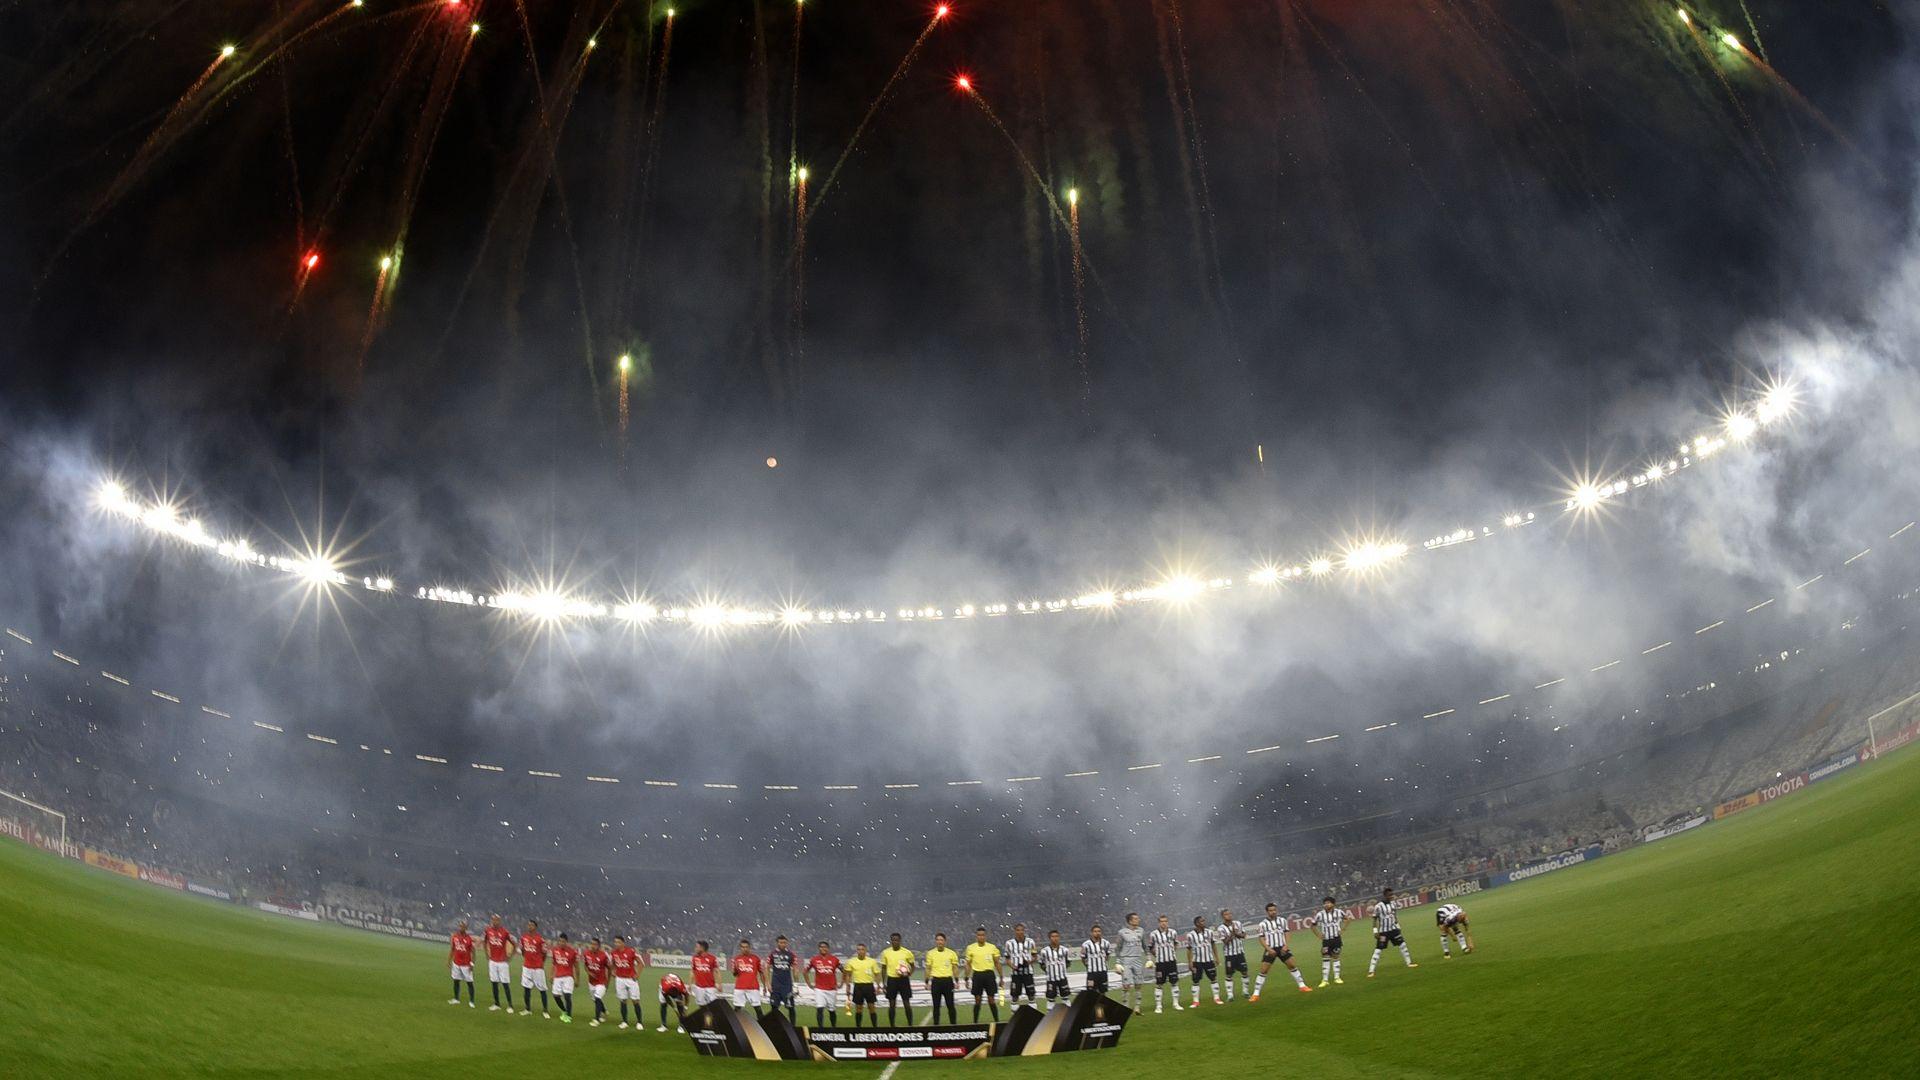 Estadio Mineirao Atletico-MG Jorge Wilstermann Libertadores 09082017